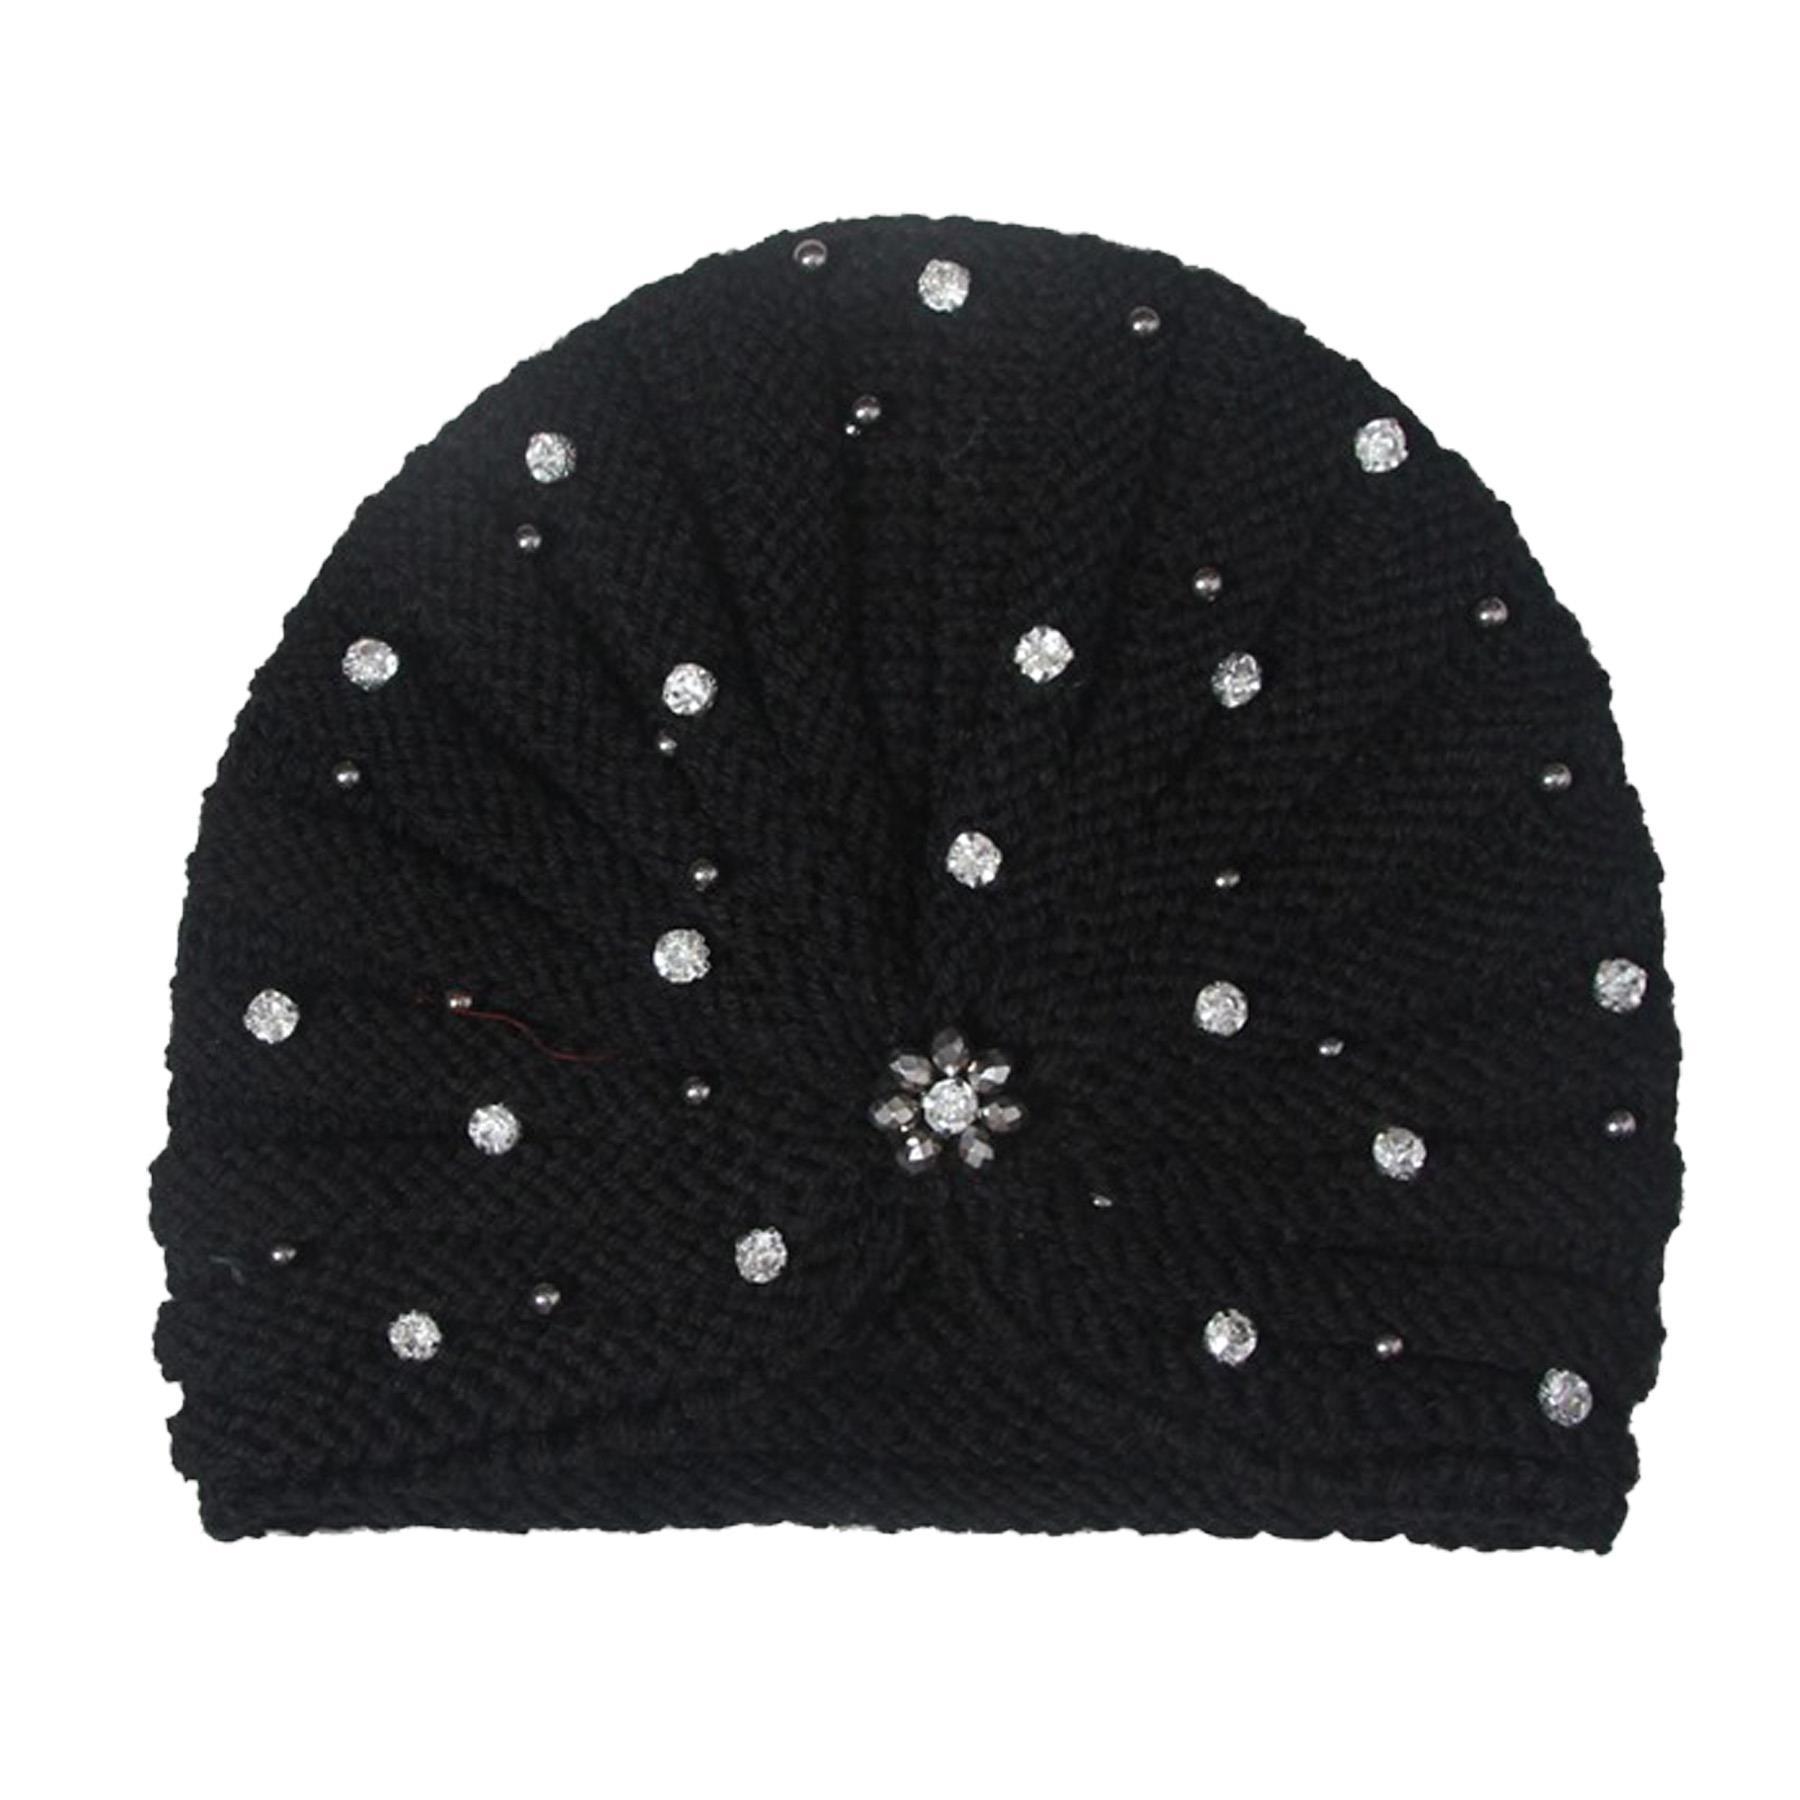 New-Women-s-Pleated-Knitted-Acrylic-Jewel-Detail-Headwear-Turban-Cap thumbnail 13